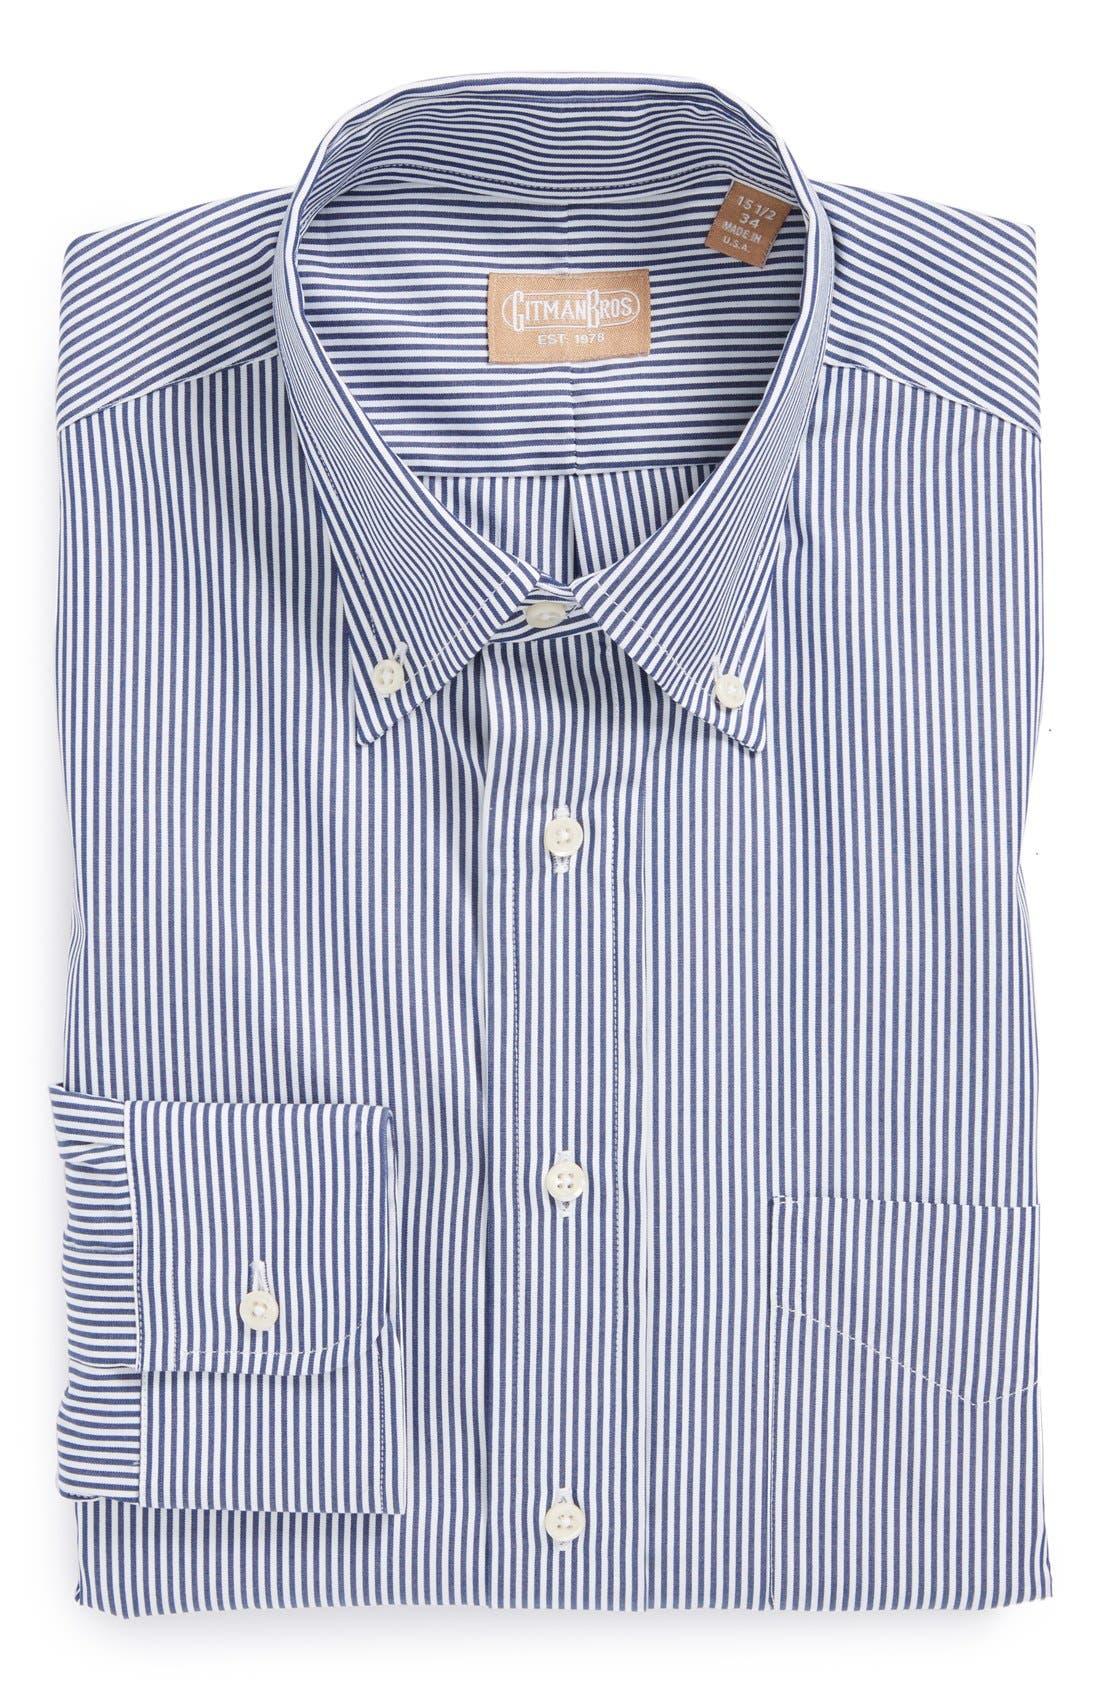 GITMAN, Regular Fit Bengal Stripe Cotton Broadcloth Button Down Dress Shirt, Main thumbnail 1, color, NAVY